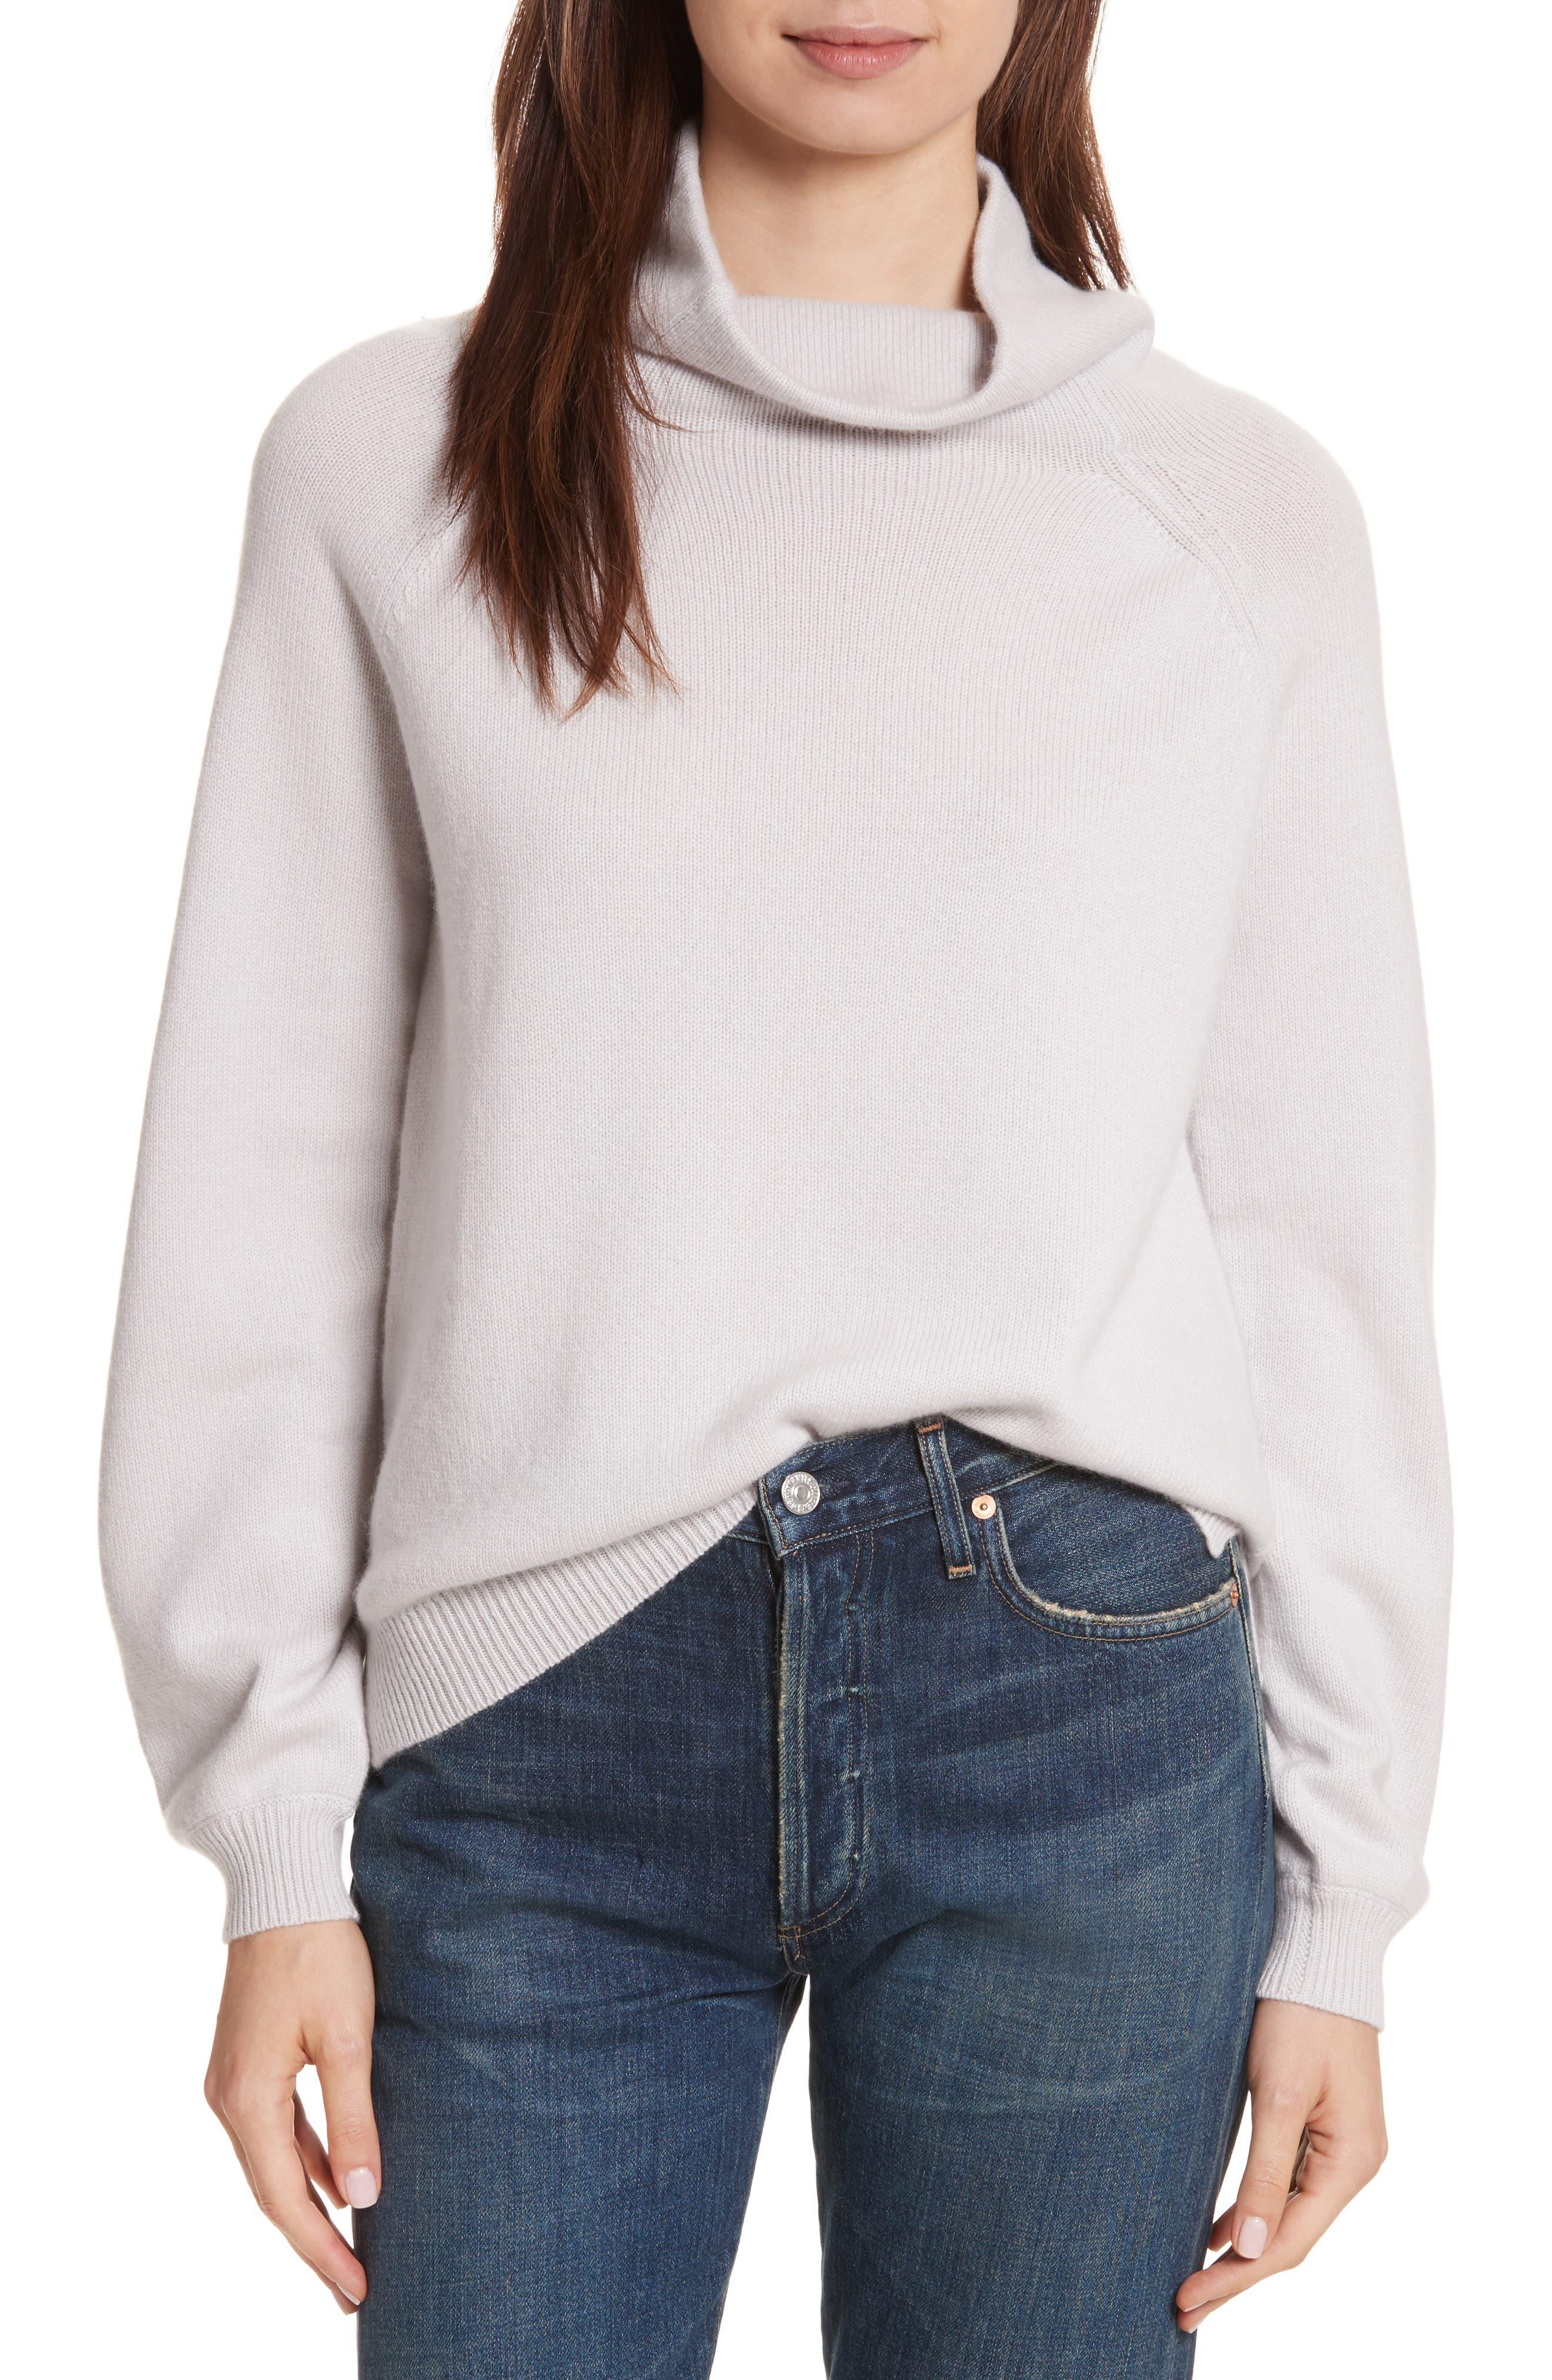 Balloon Sleeve Cashmere Turtleneck Sweater,                         Main,                         color, Light Grey